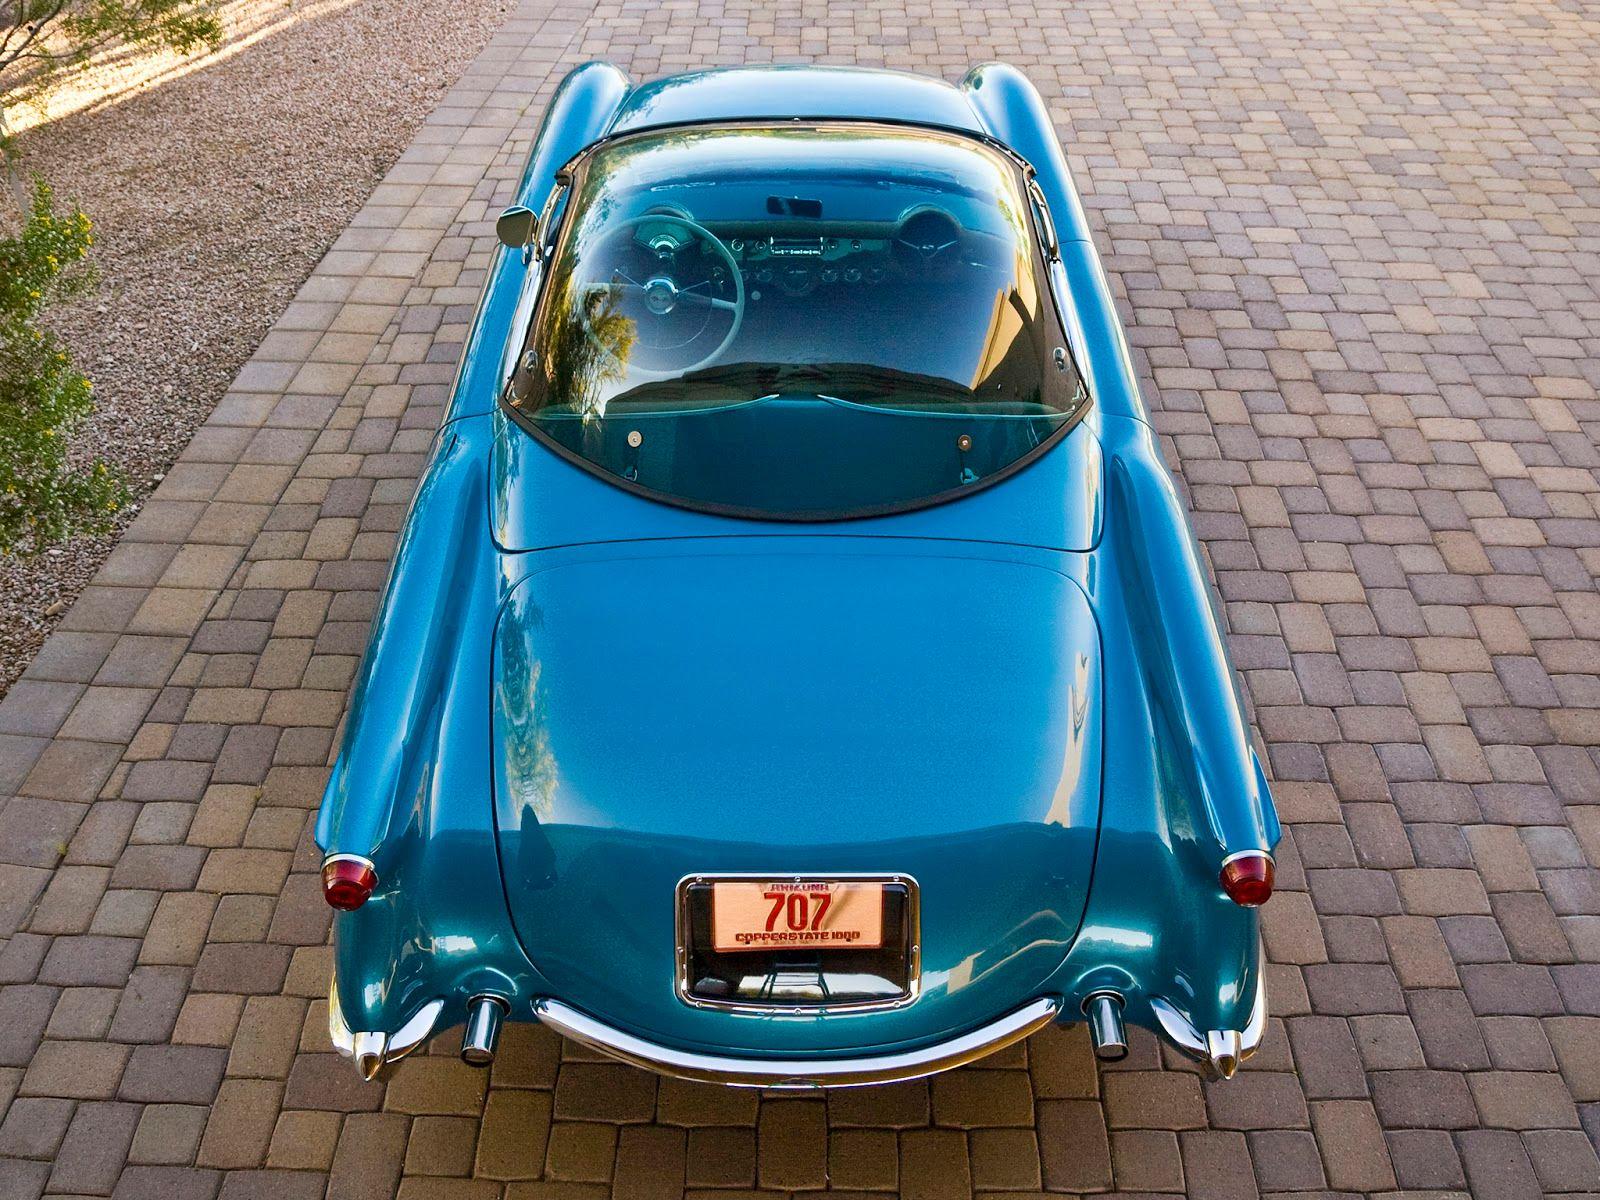 Fab Wheels Digest Fwd 1954 Chevrolet Corvette Generation 1 Chevy Stingray Thursday July 21 2011